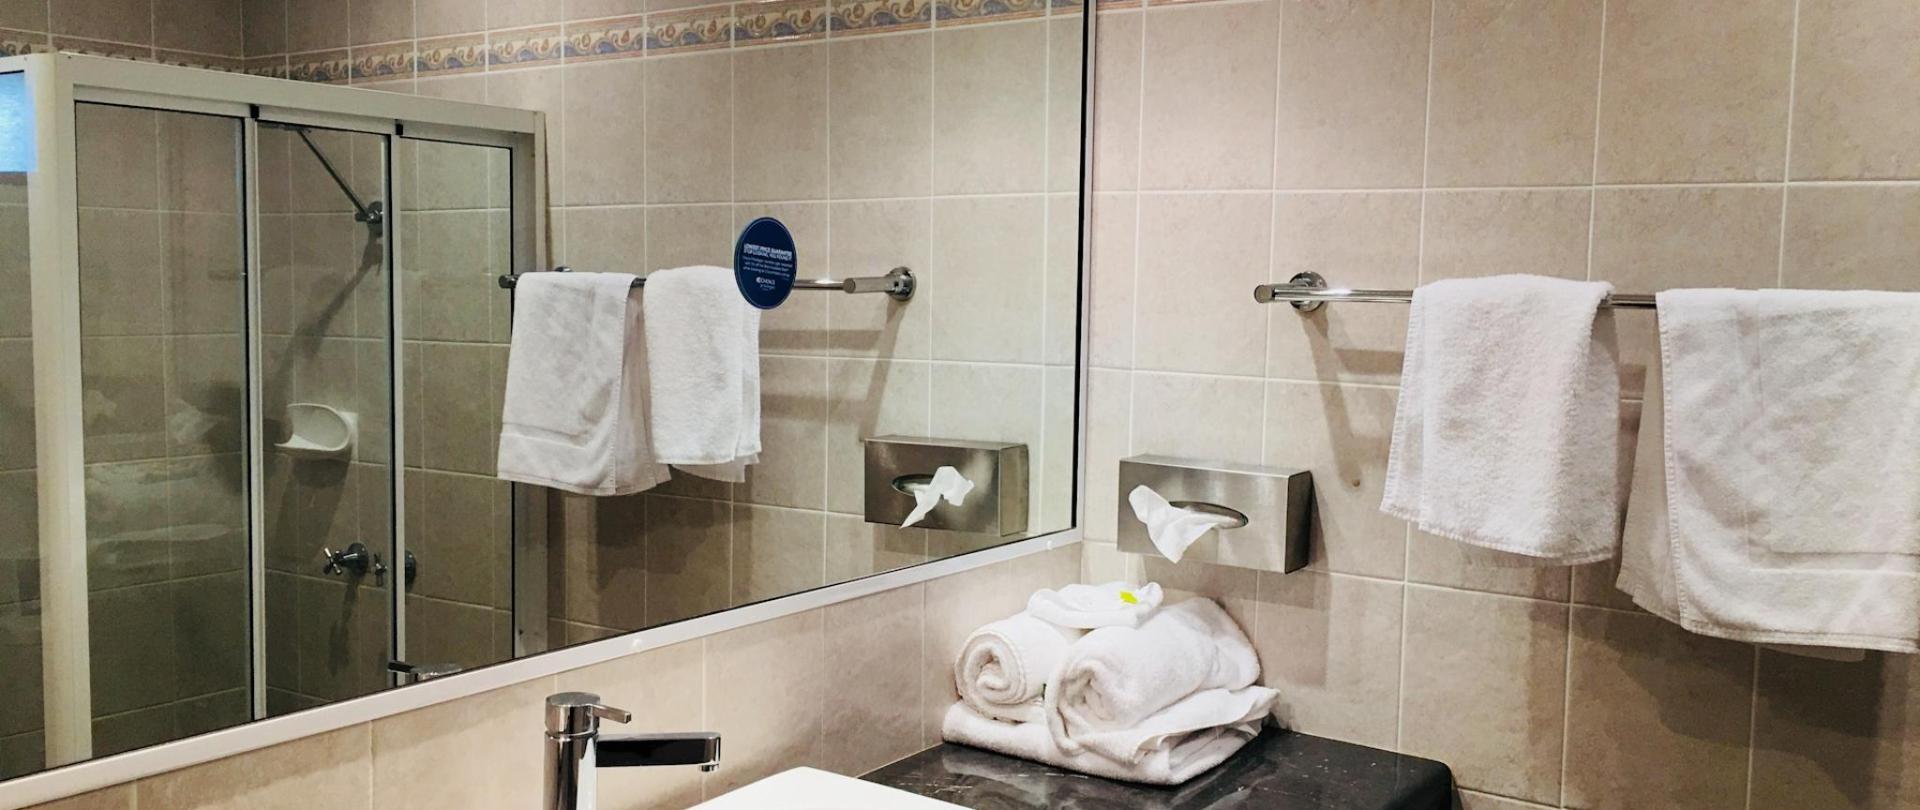 Queen & Single Bathroom view_edited.jpg